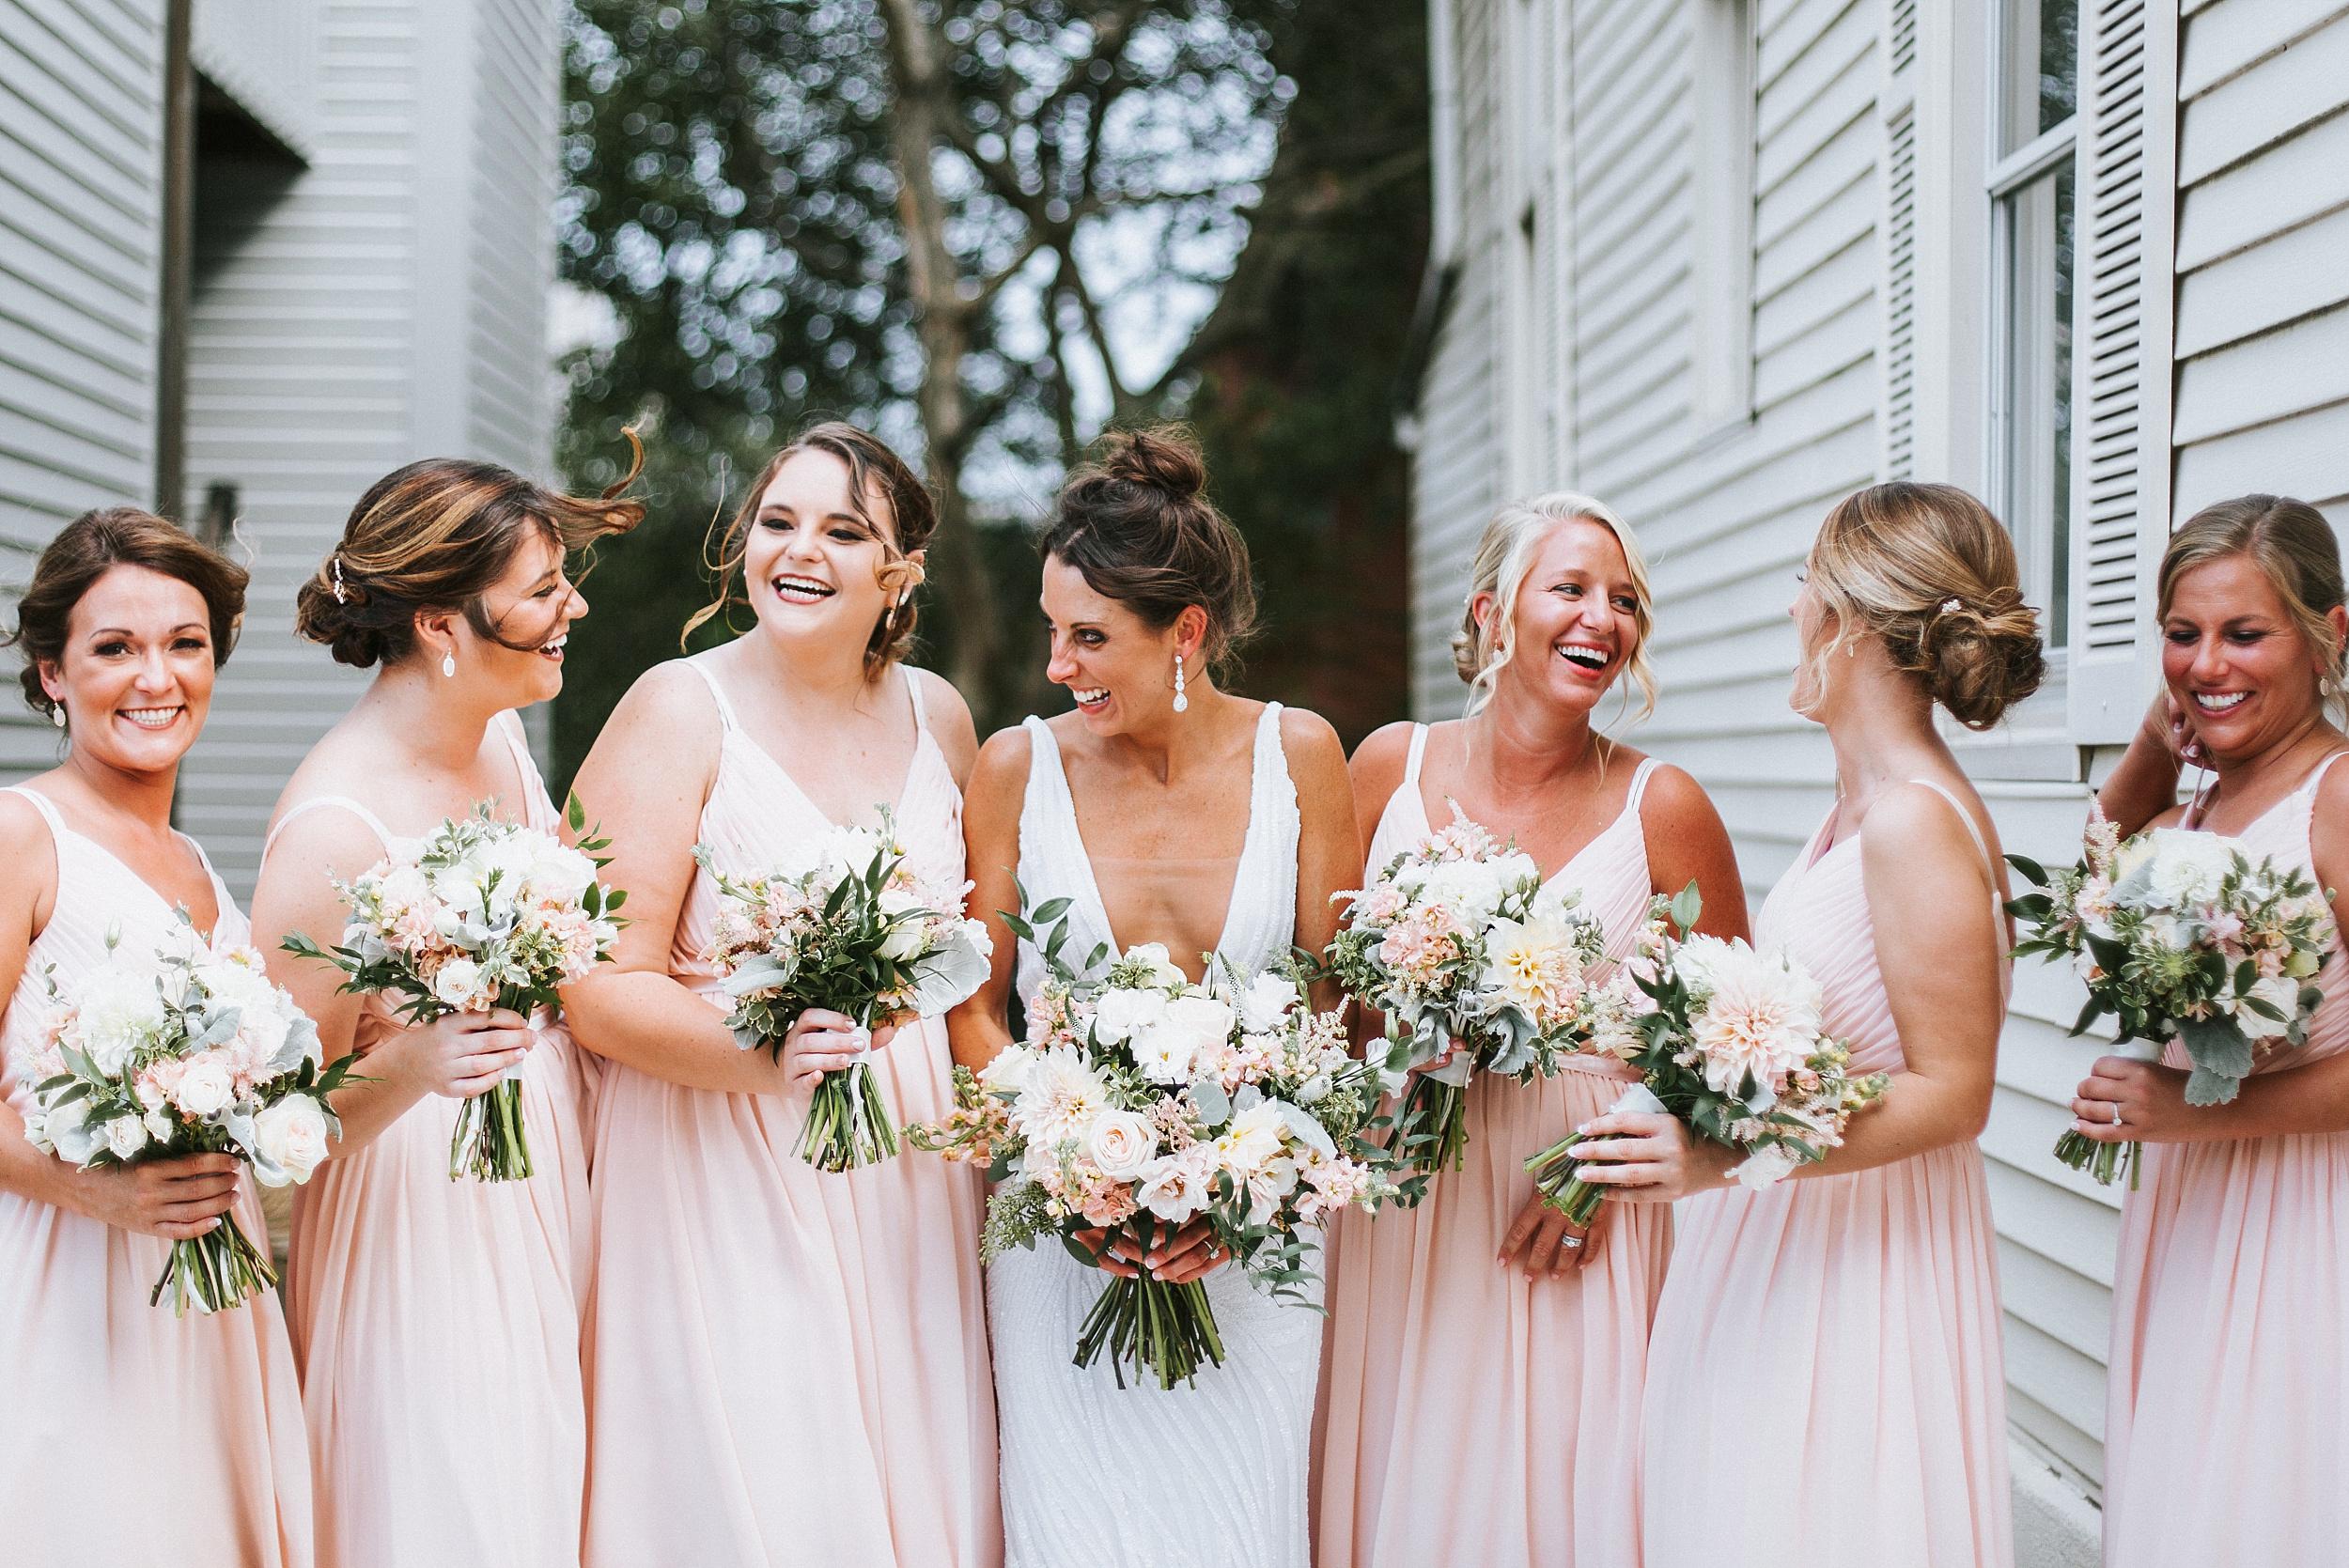 Brooke Townsend Photography - Cincinnati Wedding Photographer (56 of 170).jpg